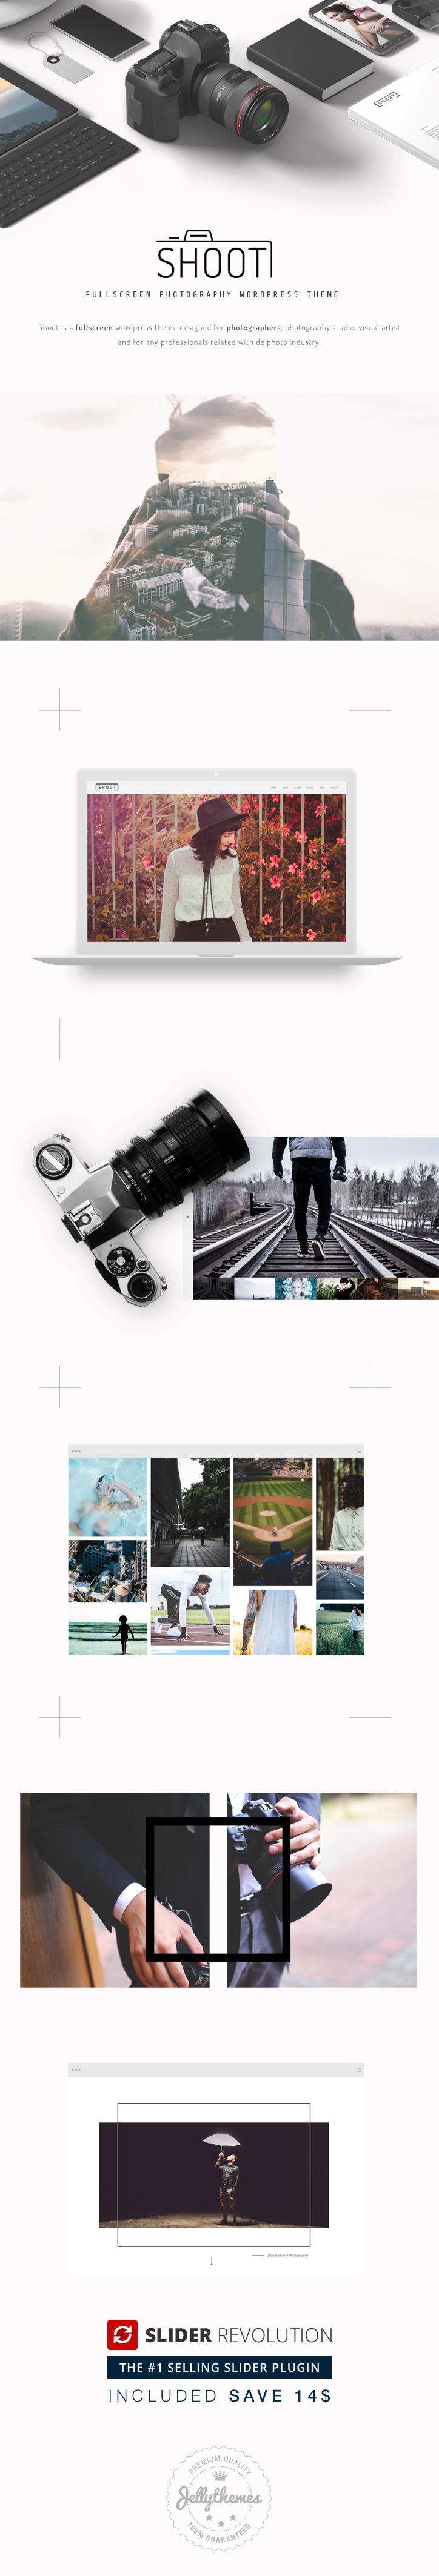 Shoot - Vollbild-Fotografie WordPress-Template - 1